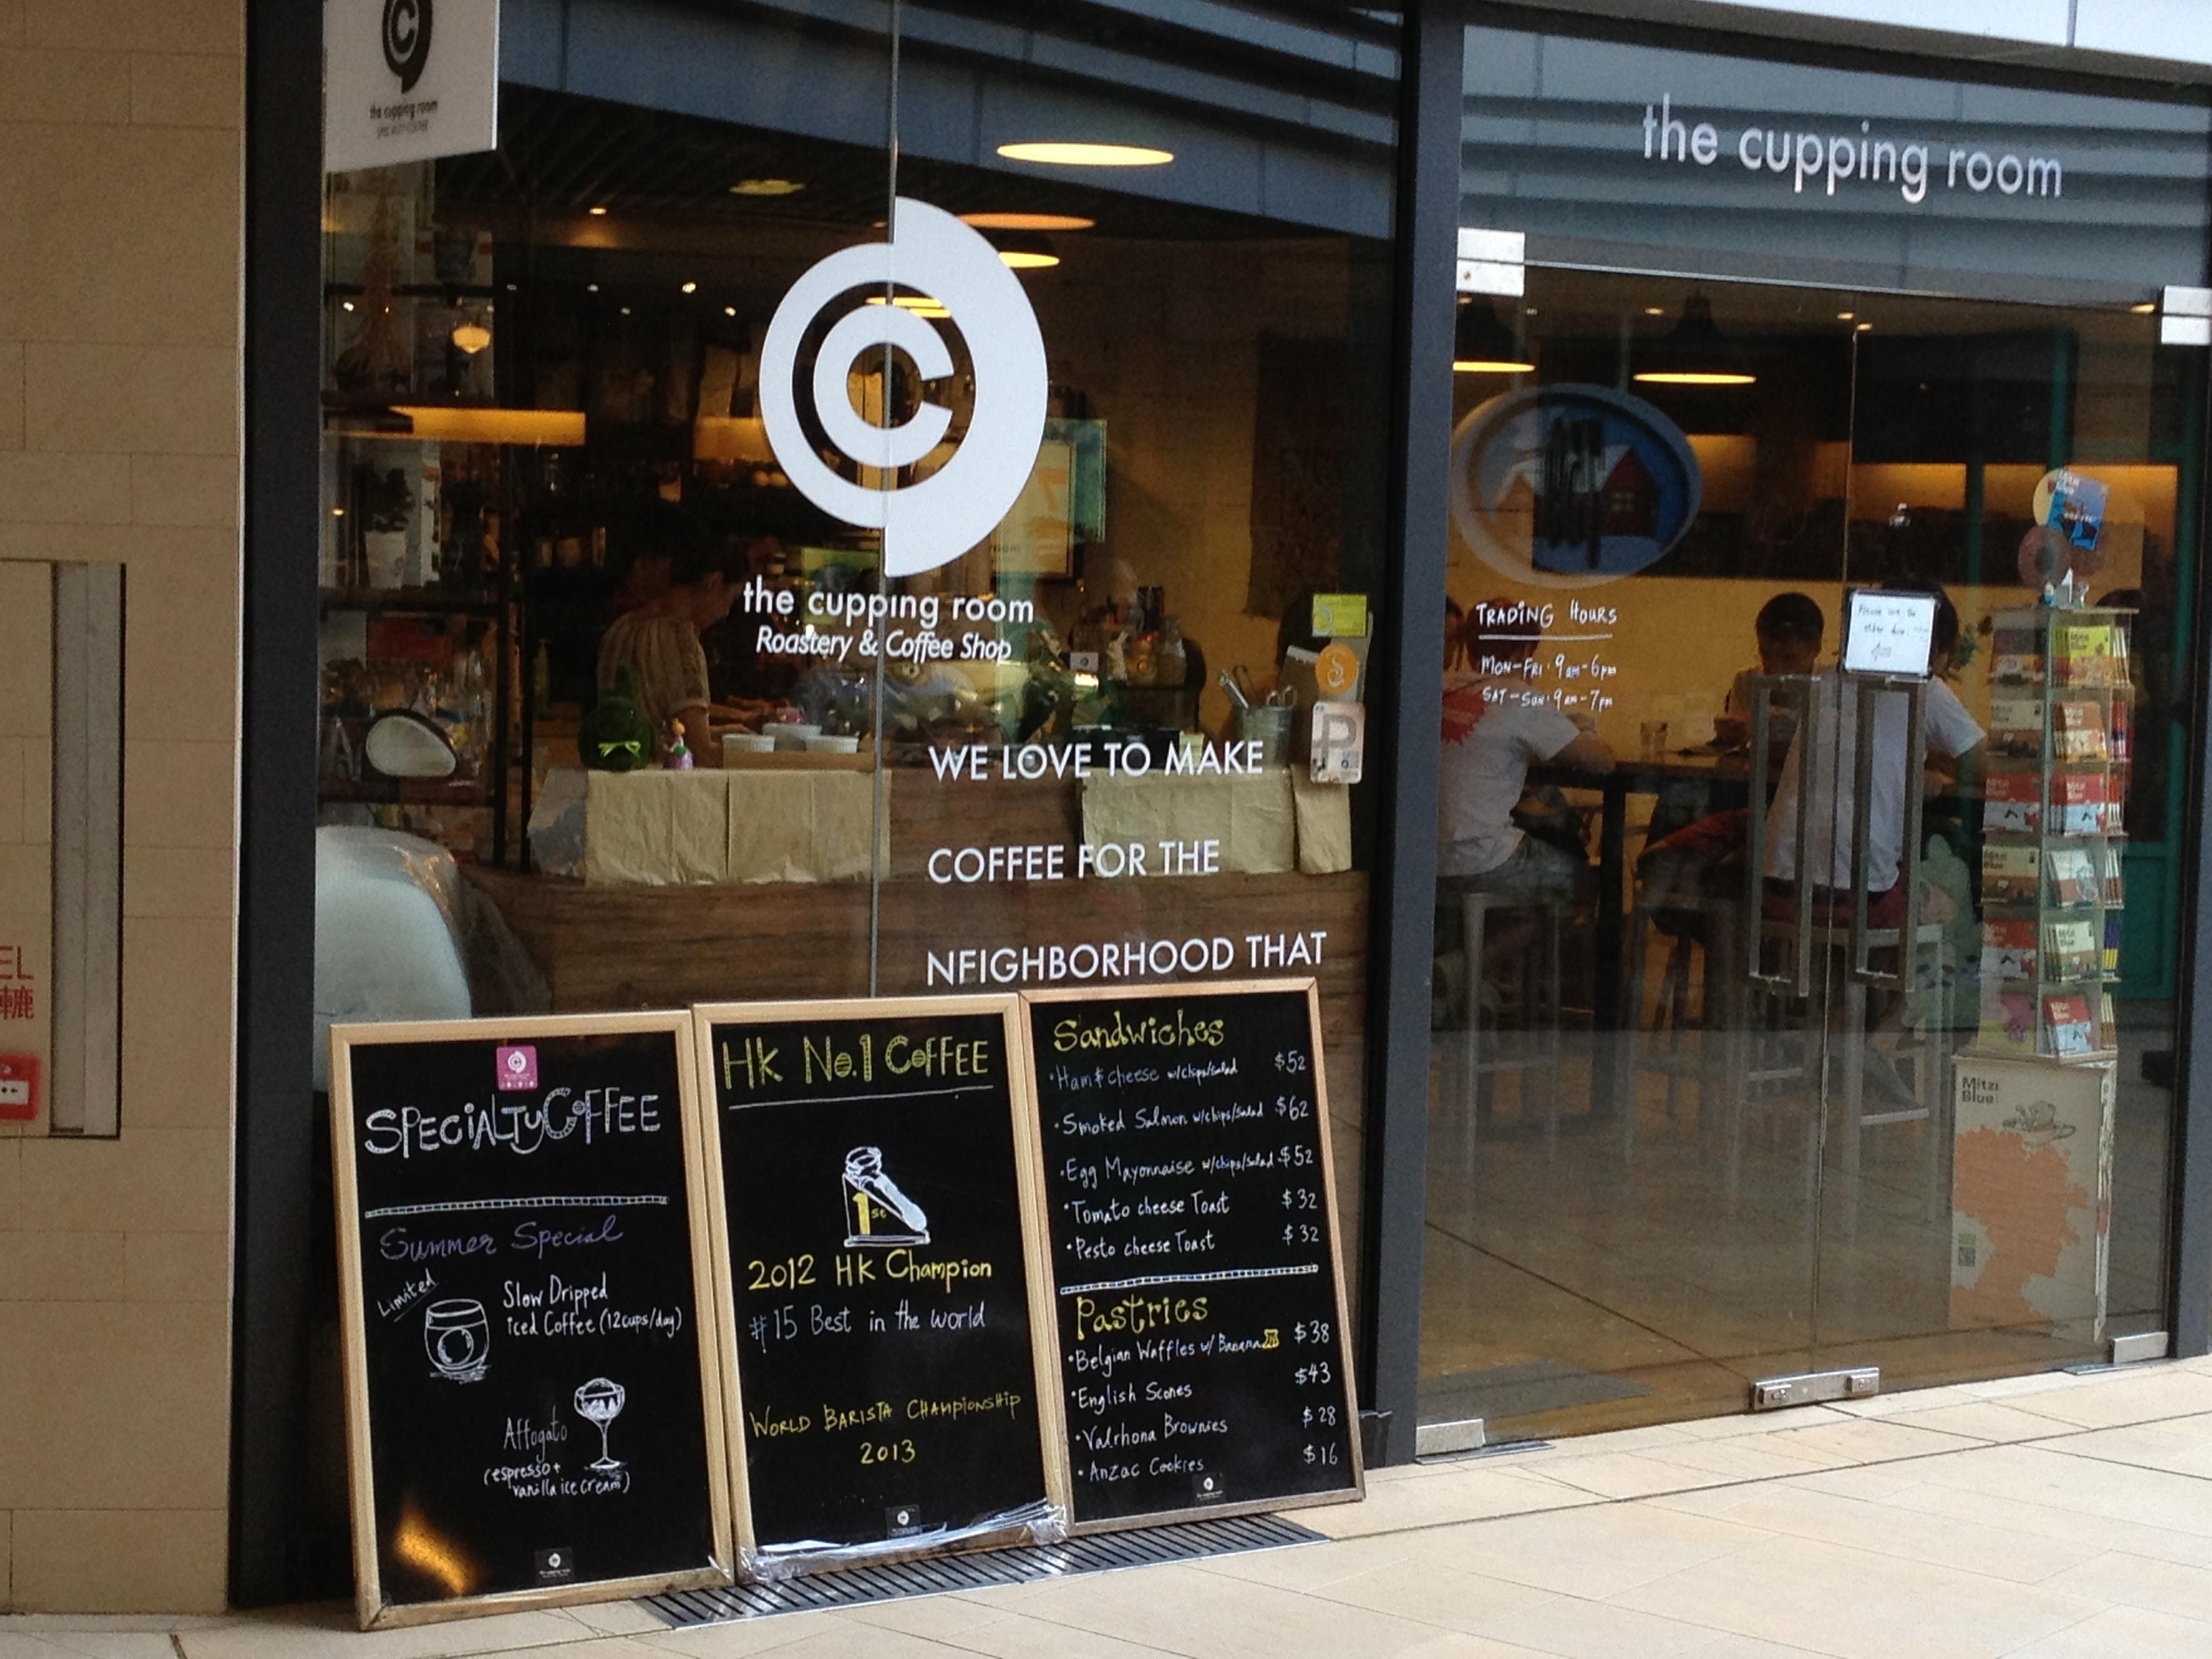 The Hong Kong Coffee Guide